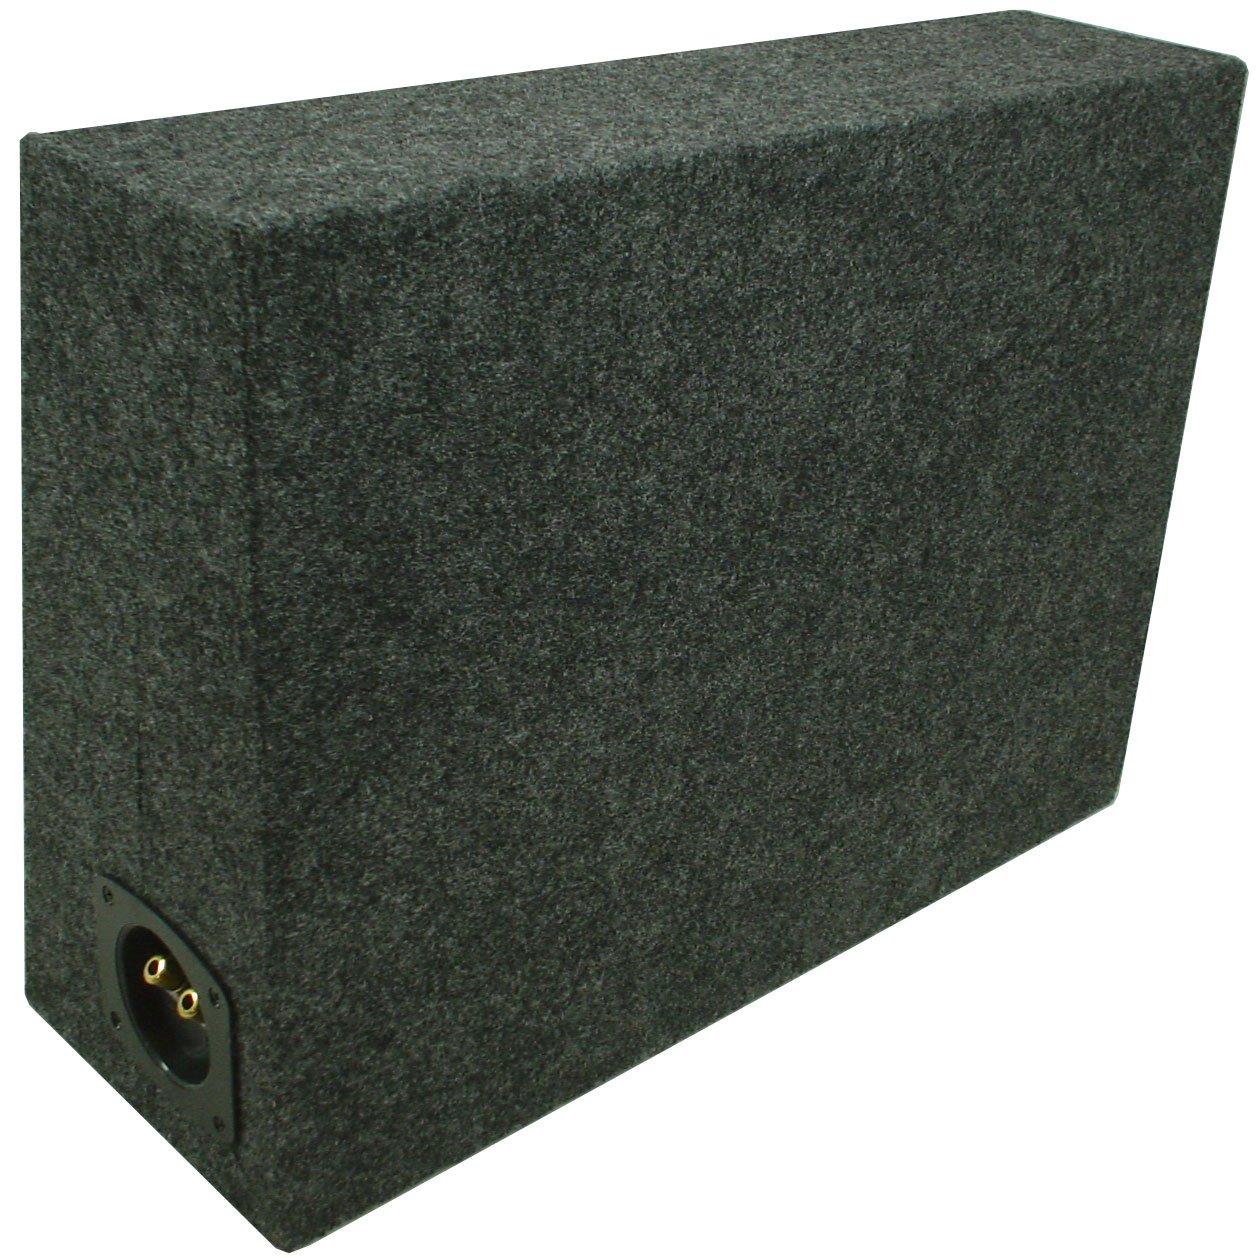 ASC Single 10'' Subwoofer Universal Regular Standard Cab Truck Sealed Sub Box Speaker Enclosure